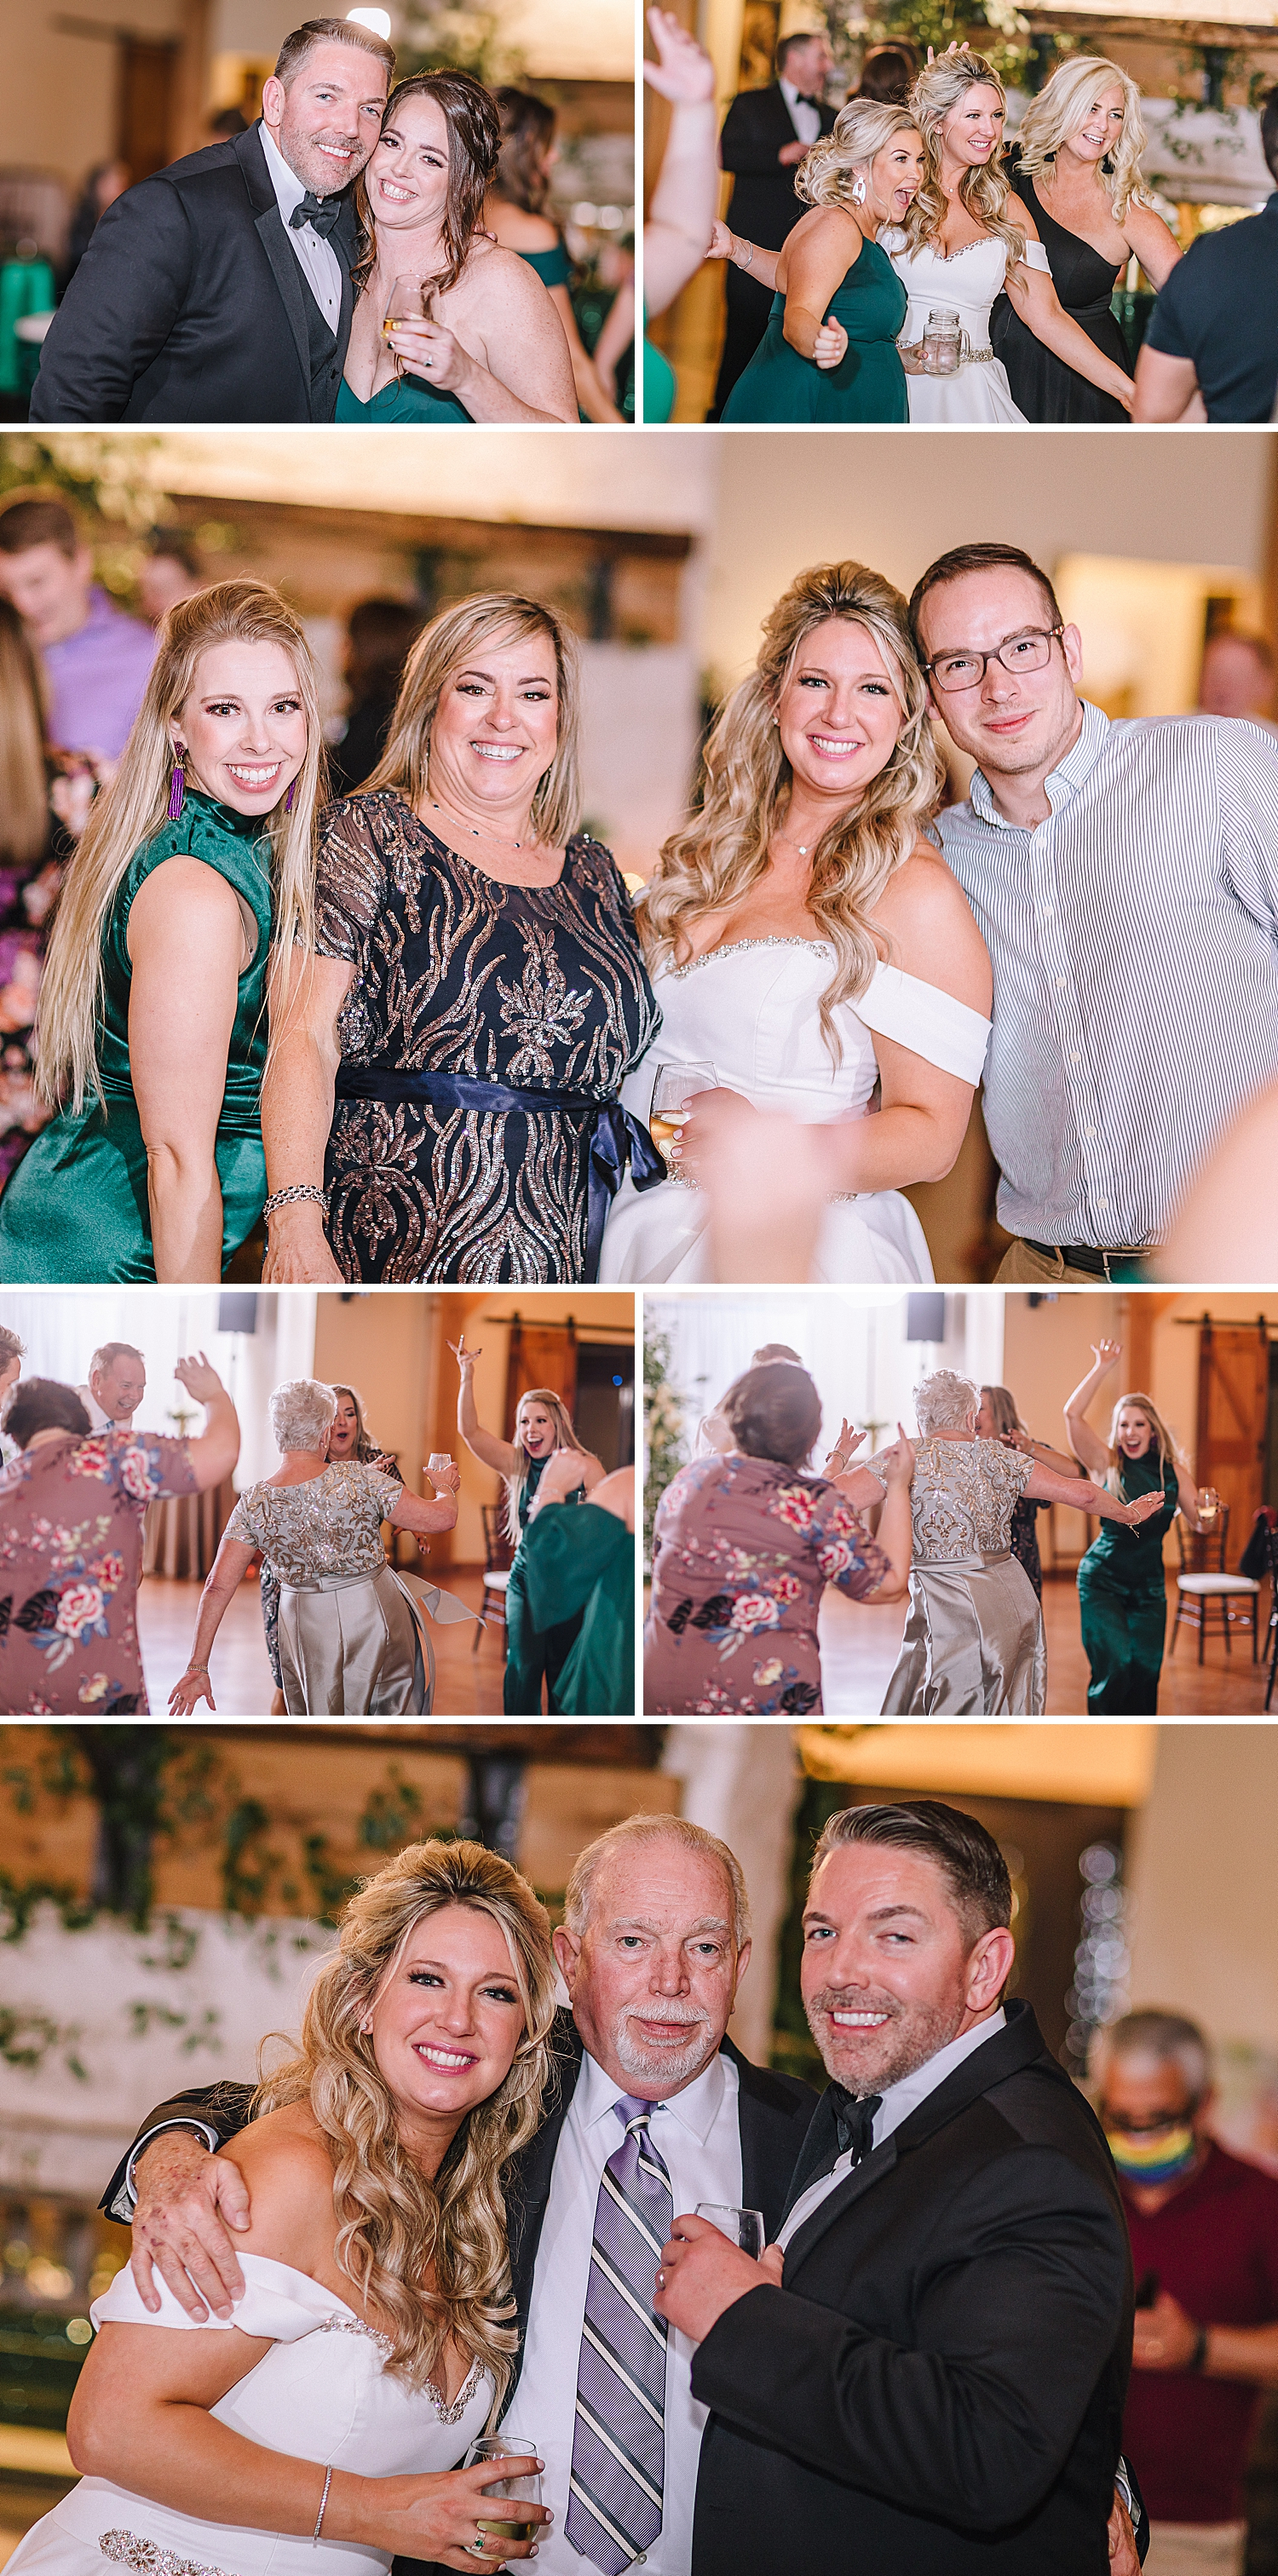 Magnolia-Halle-Wedding-San-Antonio-Texas-Bride-Grom_0102.jpg